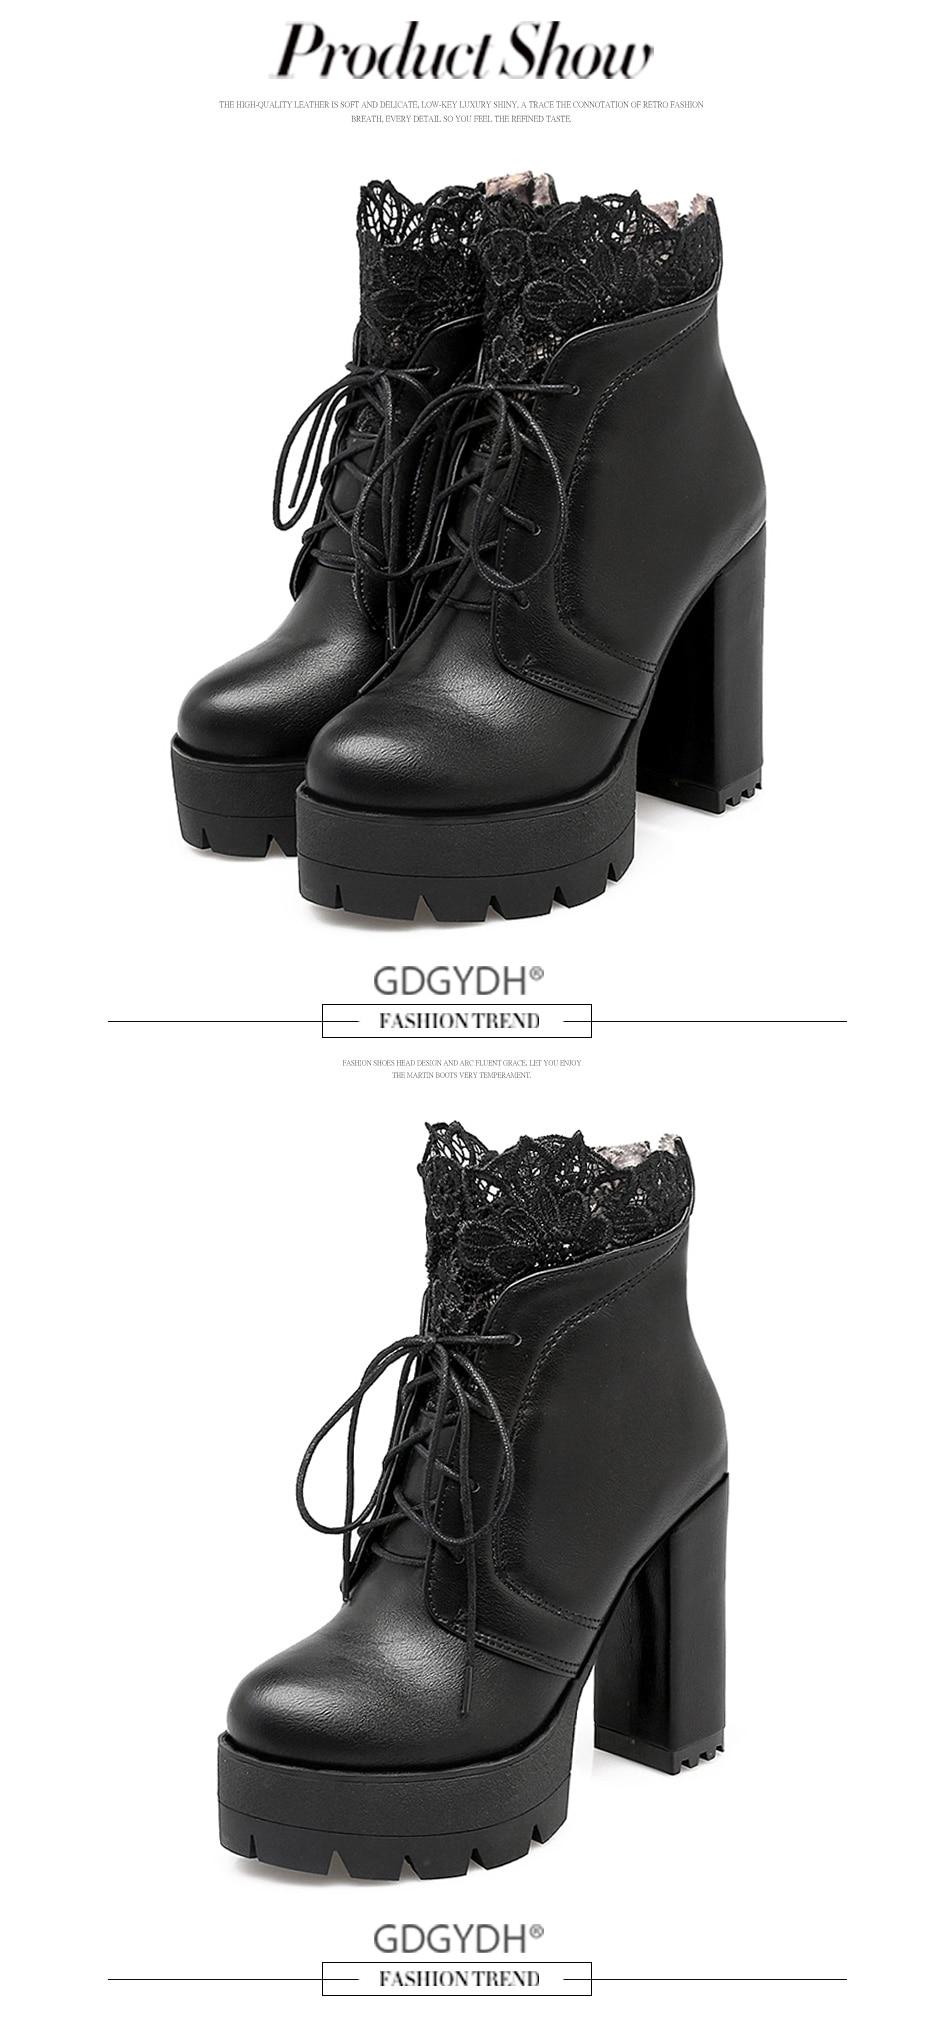 Gdgydh 2019 г. осенние женские ботинки на платформе со шнуровкой ... 8d16dc28dbd0f